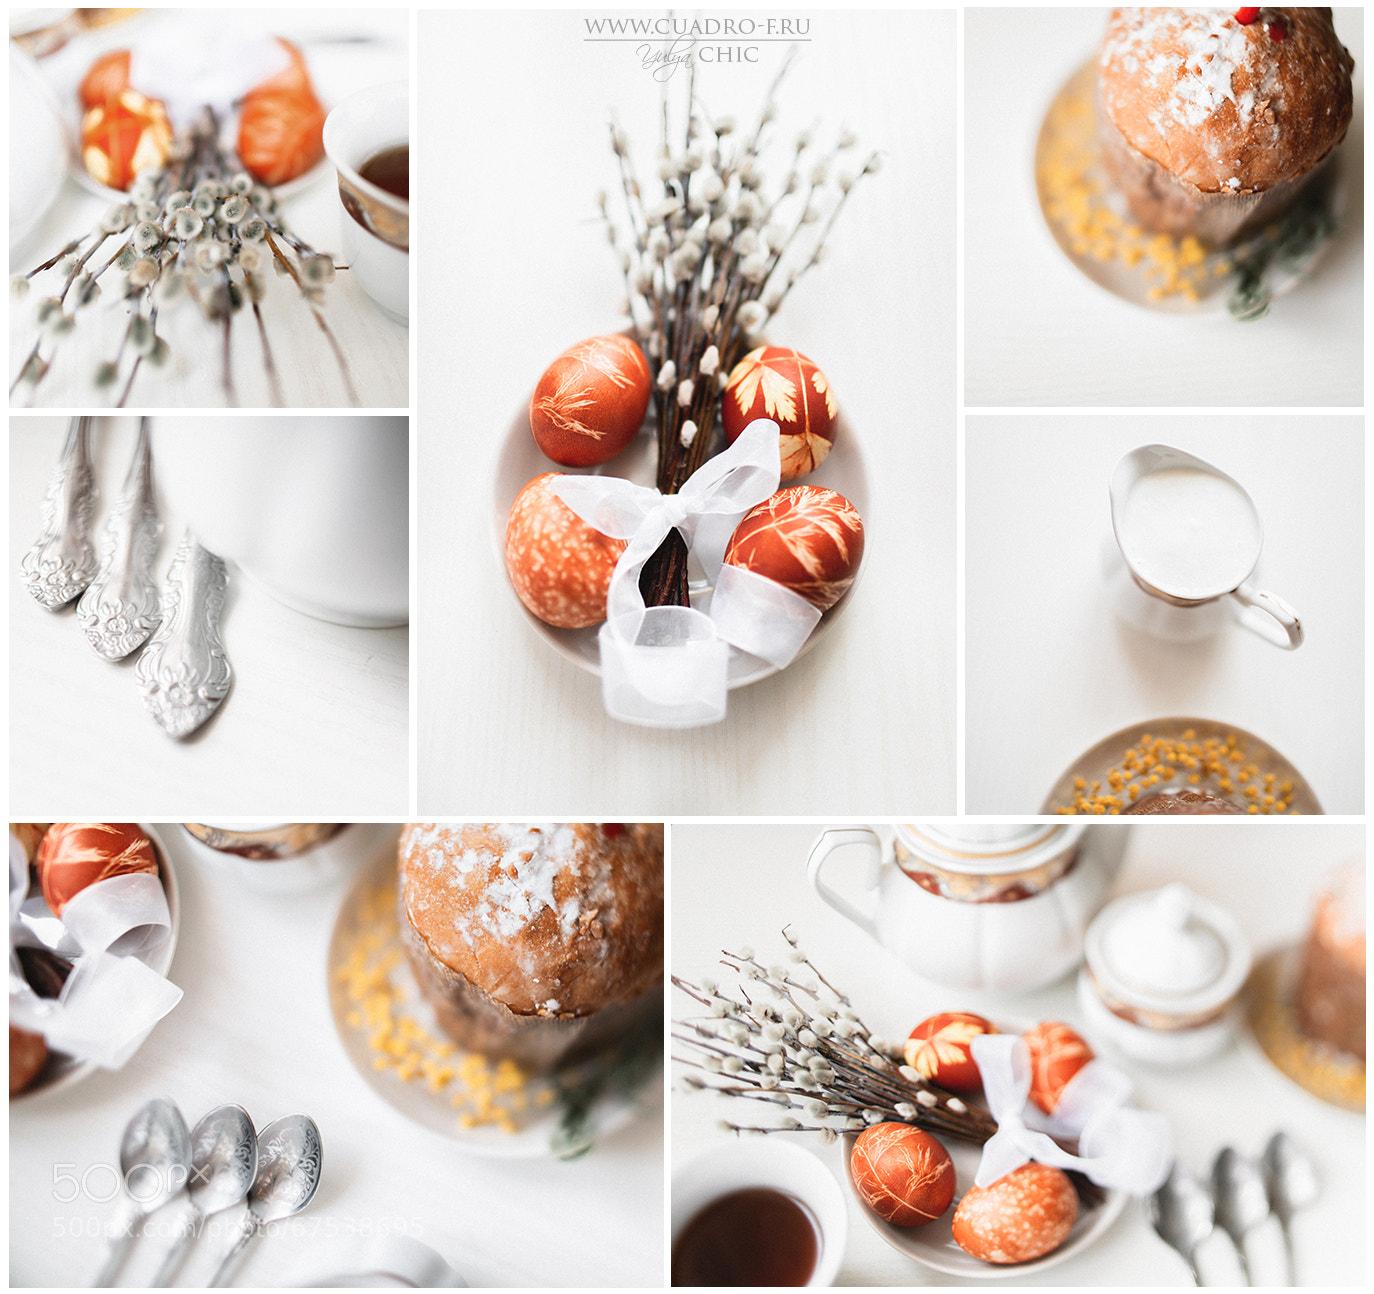 Photograph Set пасха by Yulya Chic on 500px